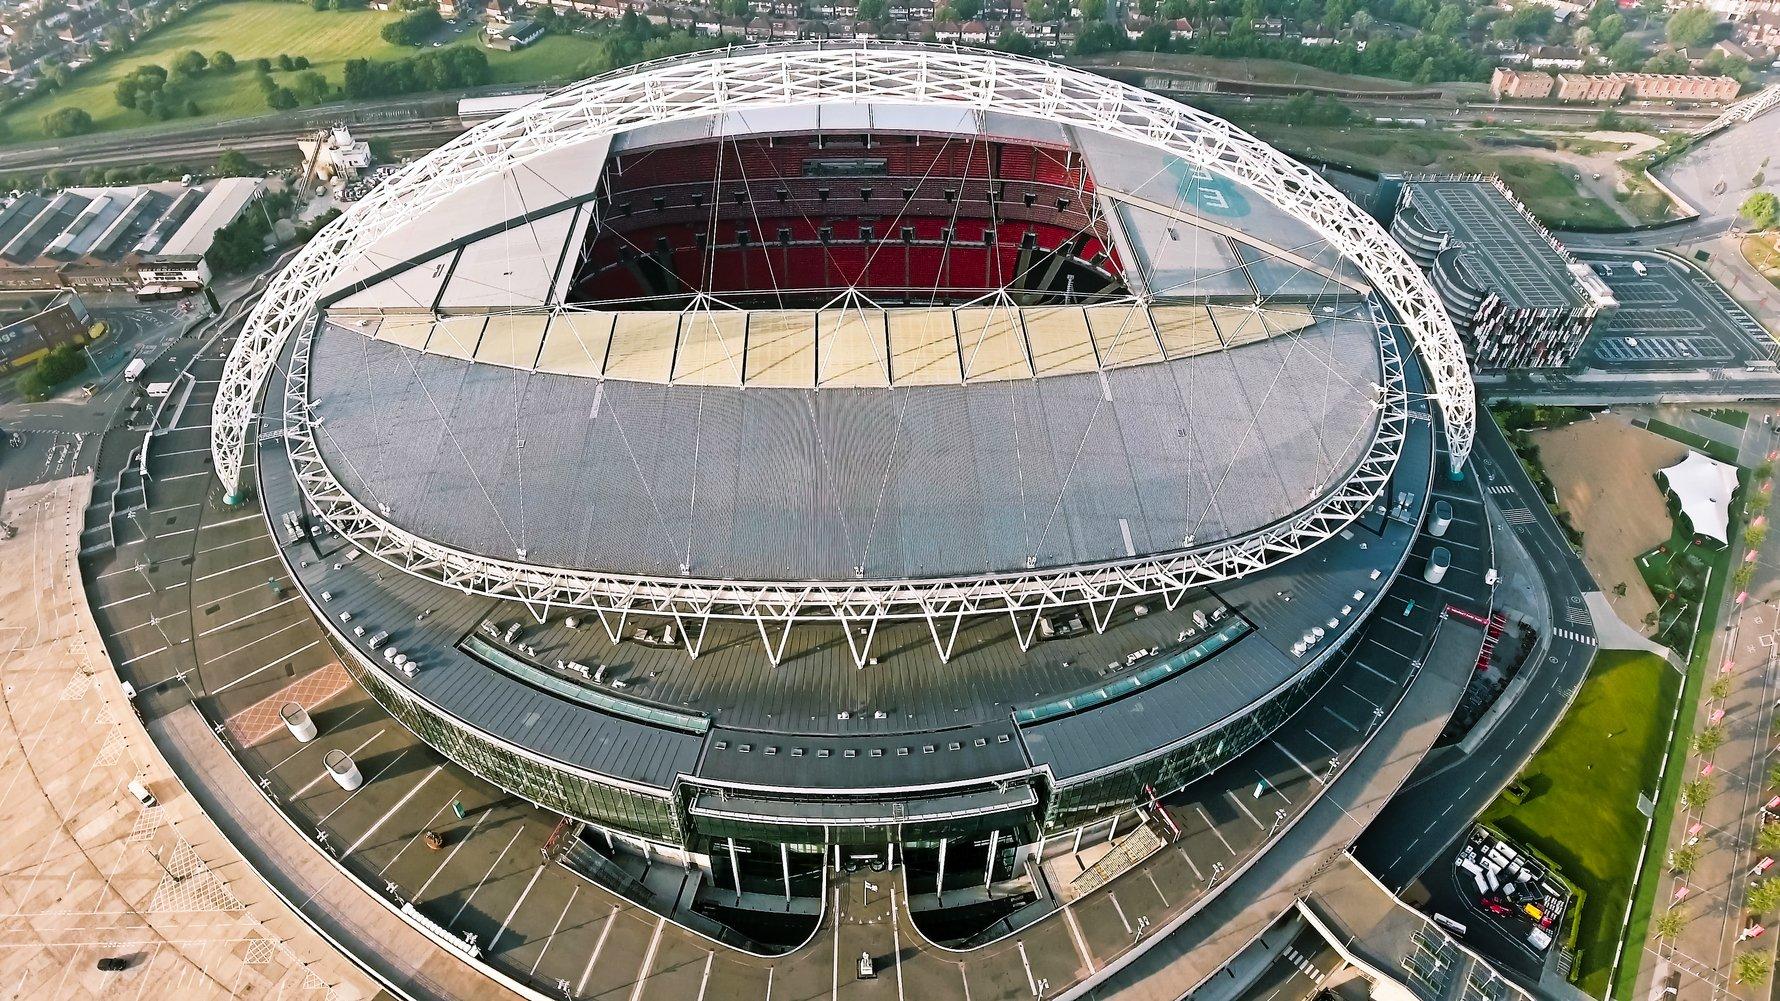 © PhotoLondonUK Shutterstock.com Wembley Stadium